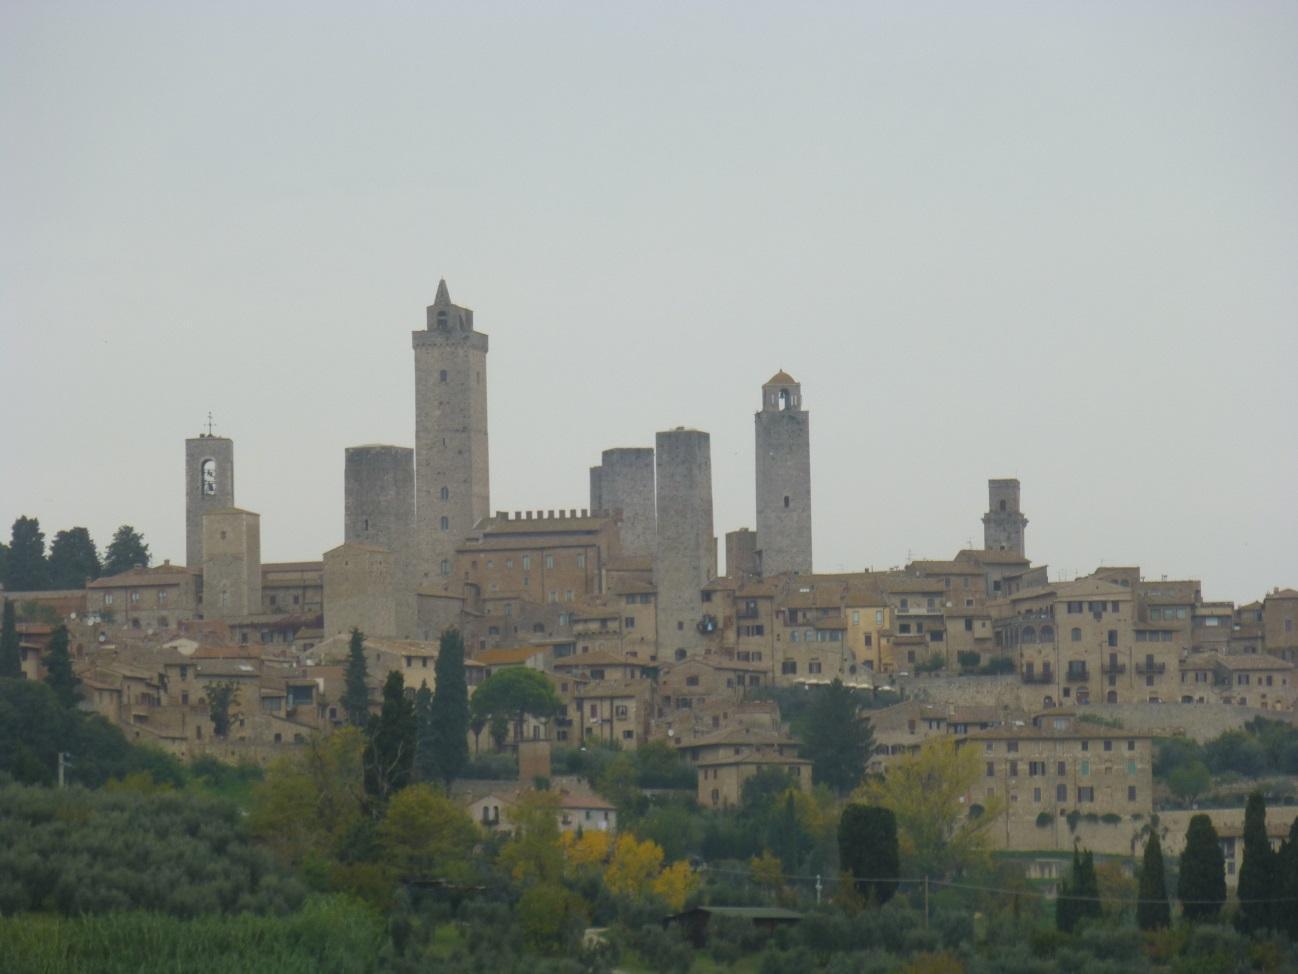 C:\Users\Gonzalo\Desktop\Documentos\Fotografías\La Toscana\103_PANA\103_PANA\P1030356.JPG